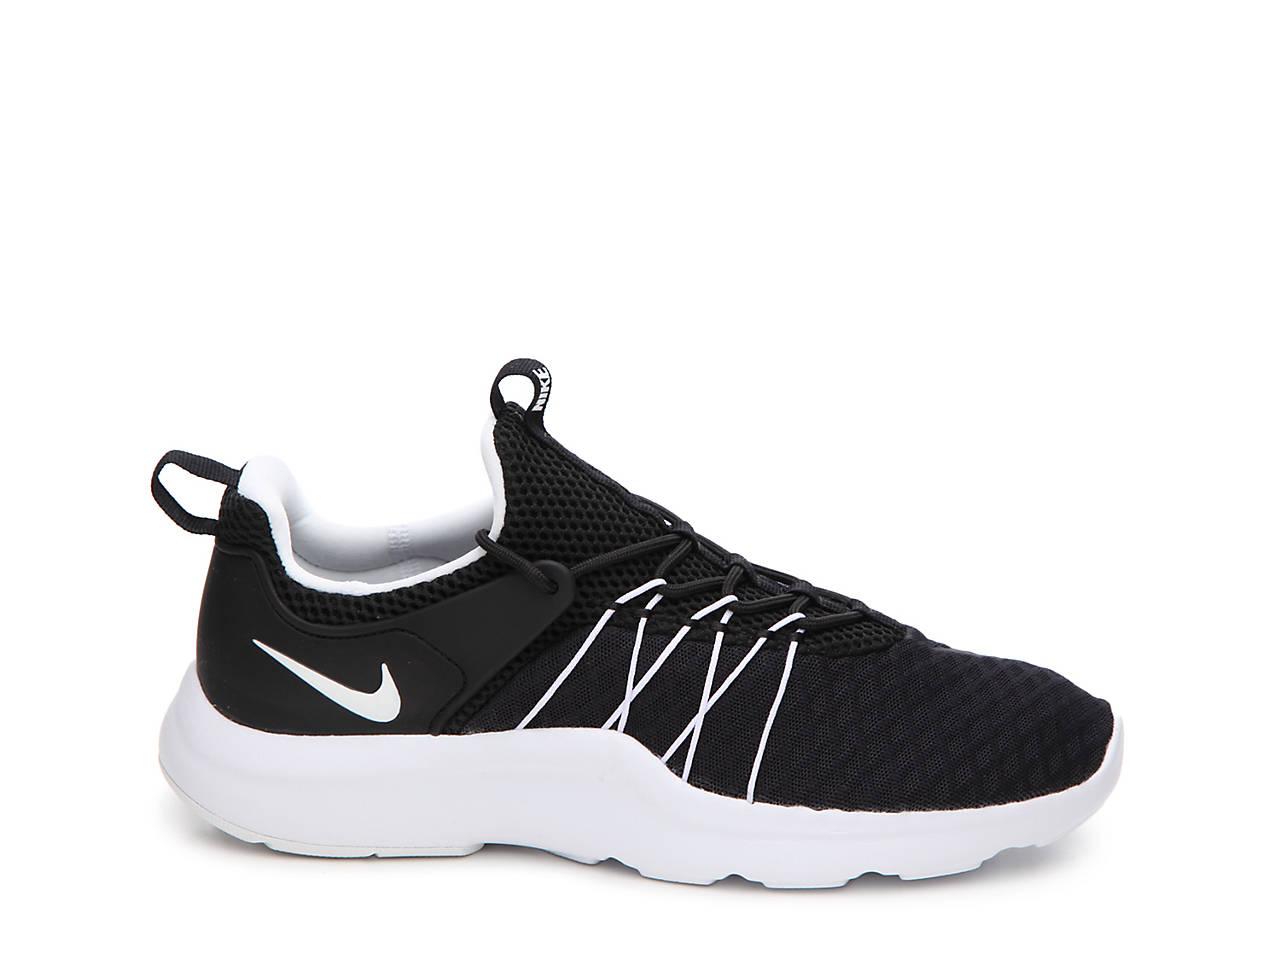 072a21ae3d49c ... buy nike darwin sneaker womens womens shoes dsw 6746a adf96